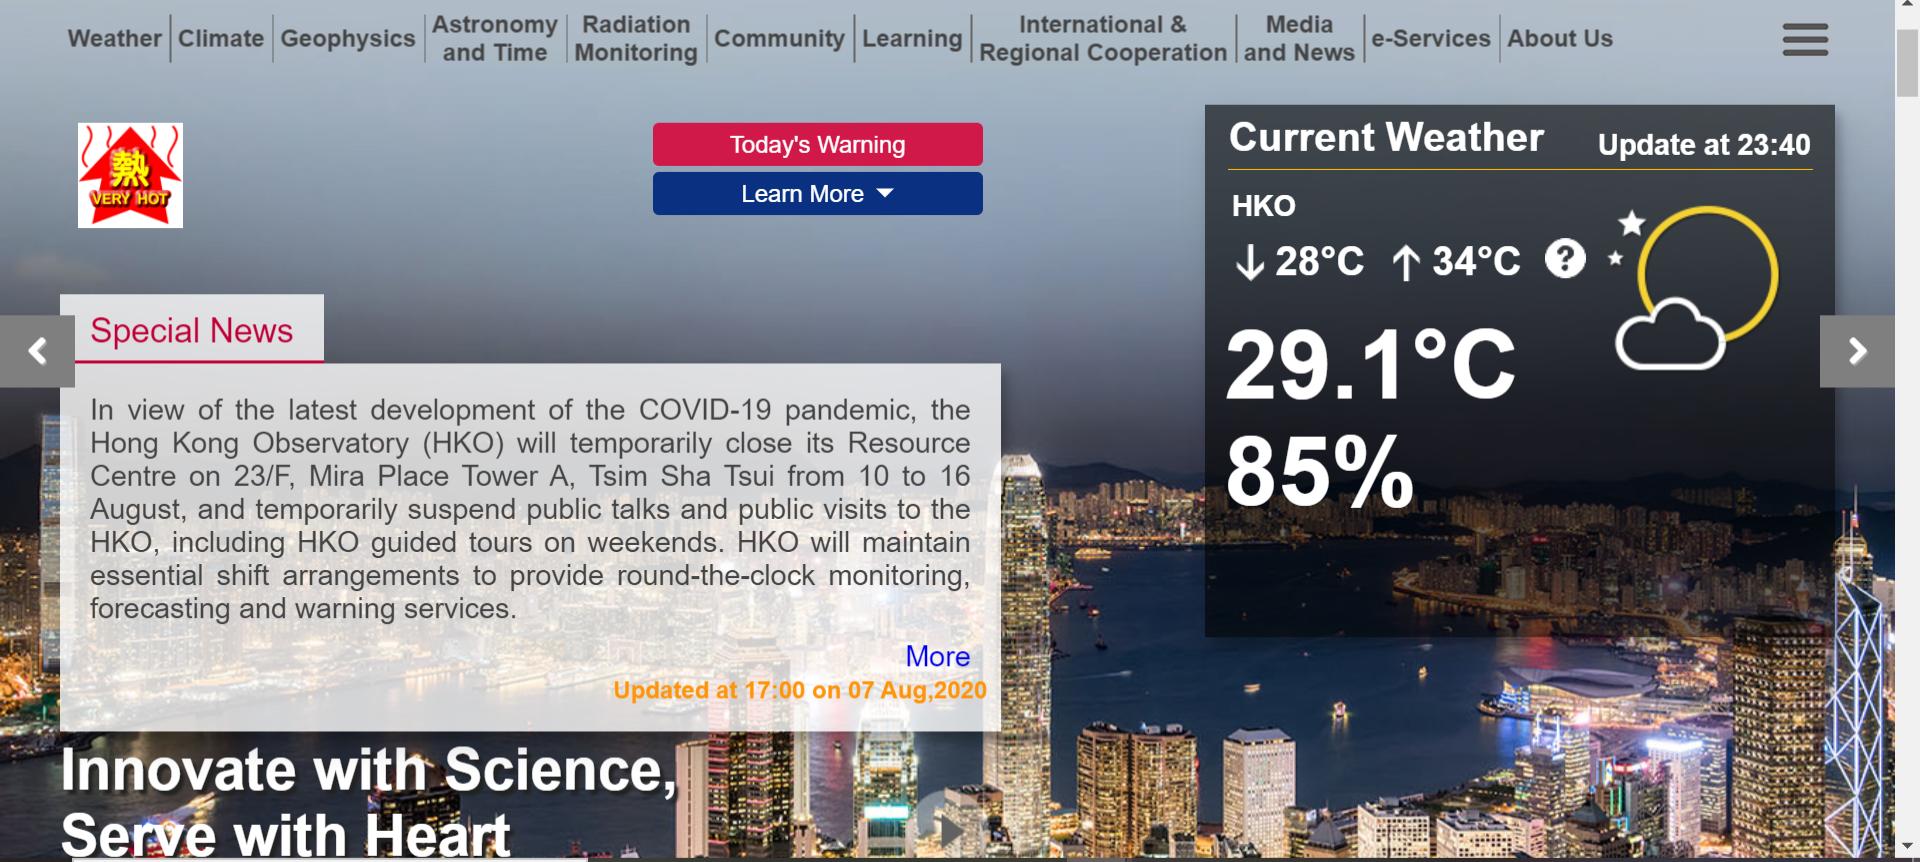 Print screen photo of Hong Kong Observatory